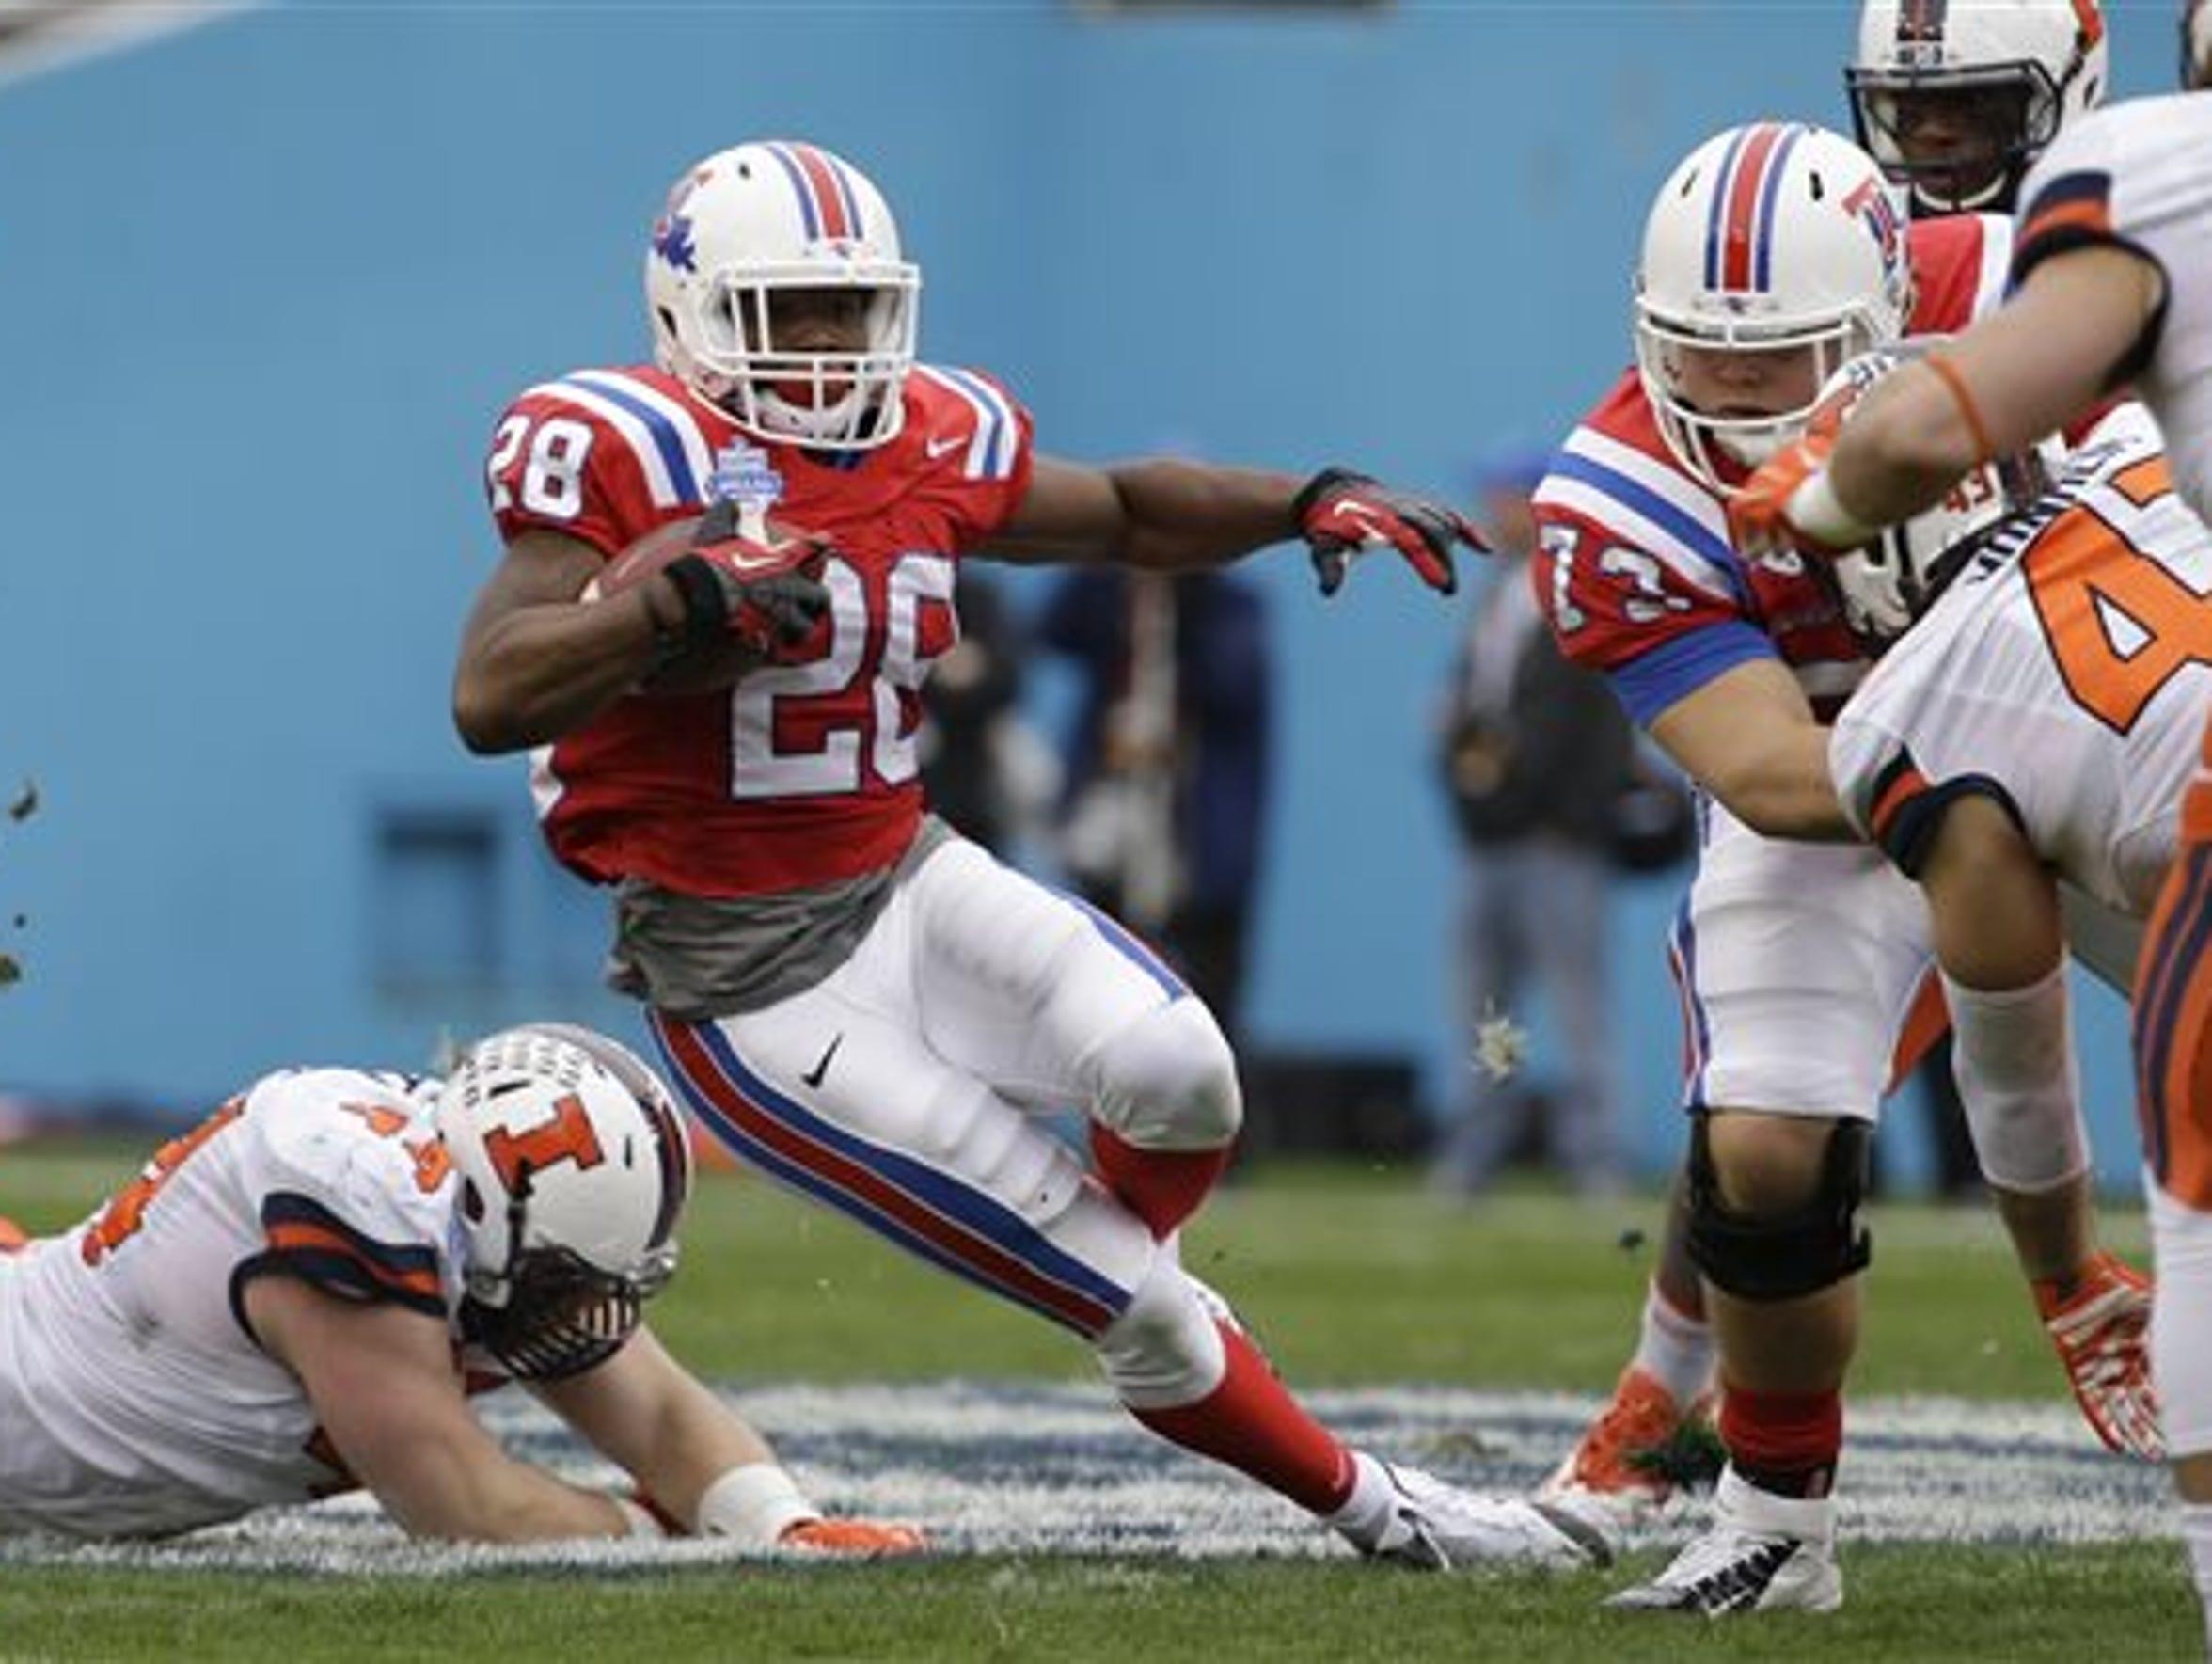 Louisiana Tech running back Kenneth Dixon (28) beats